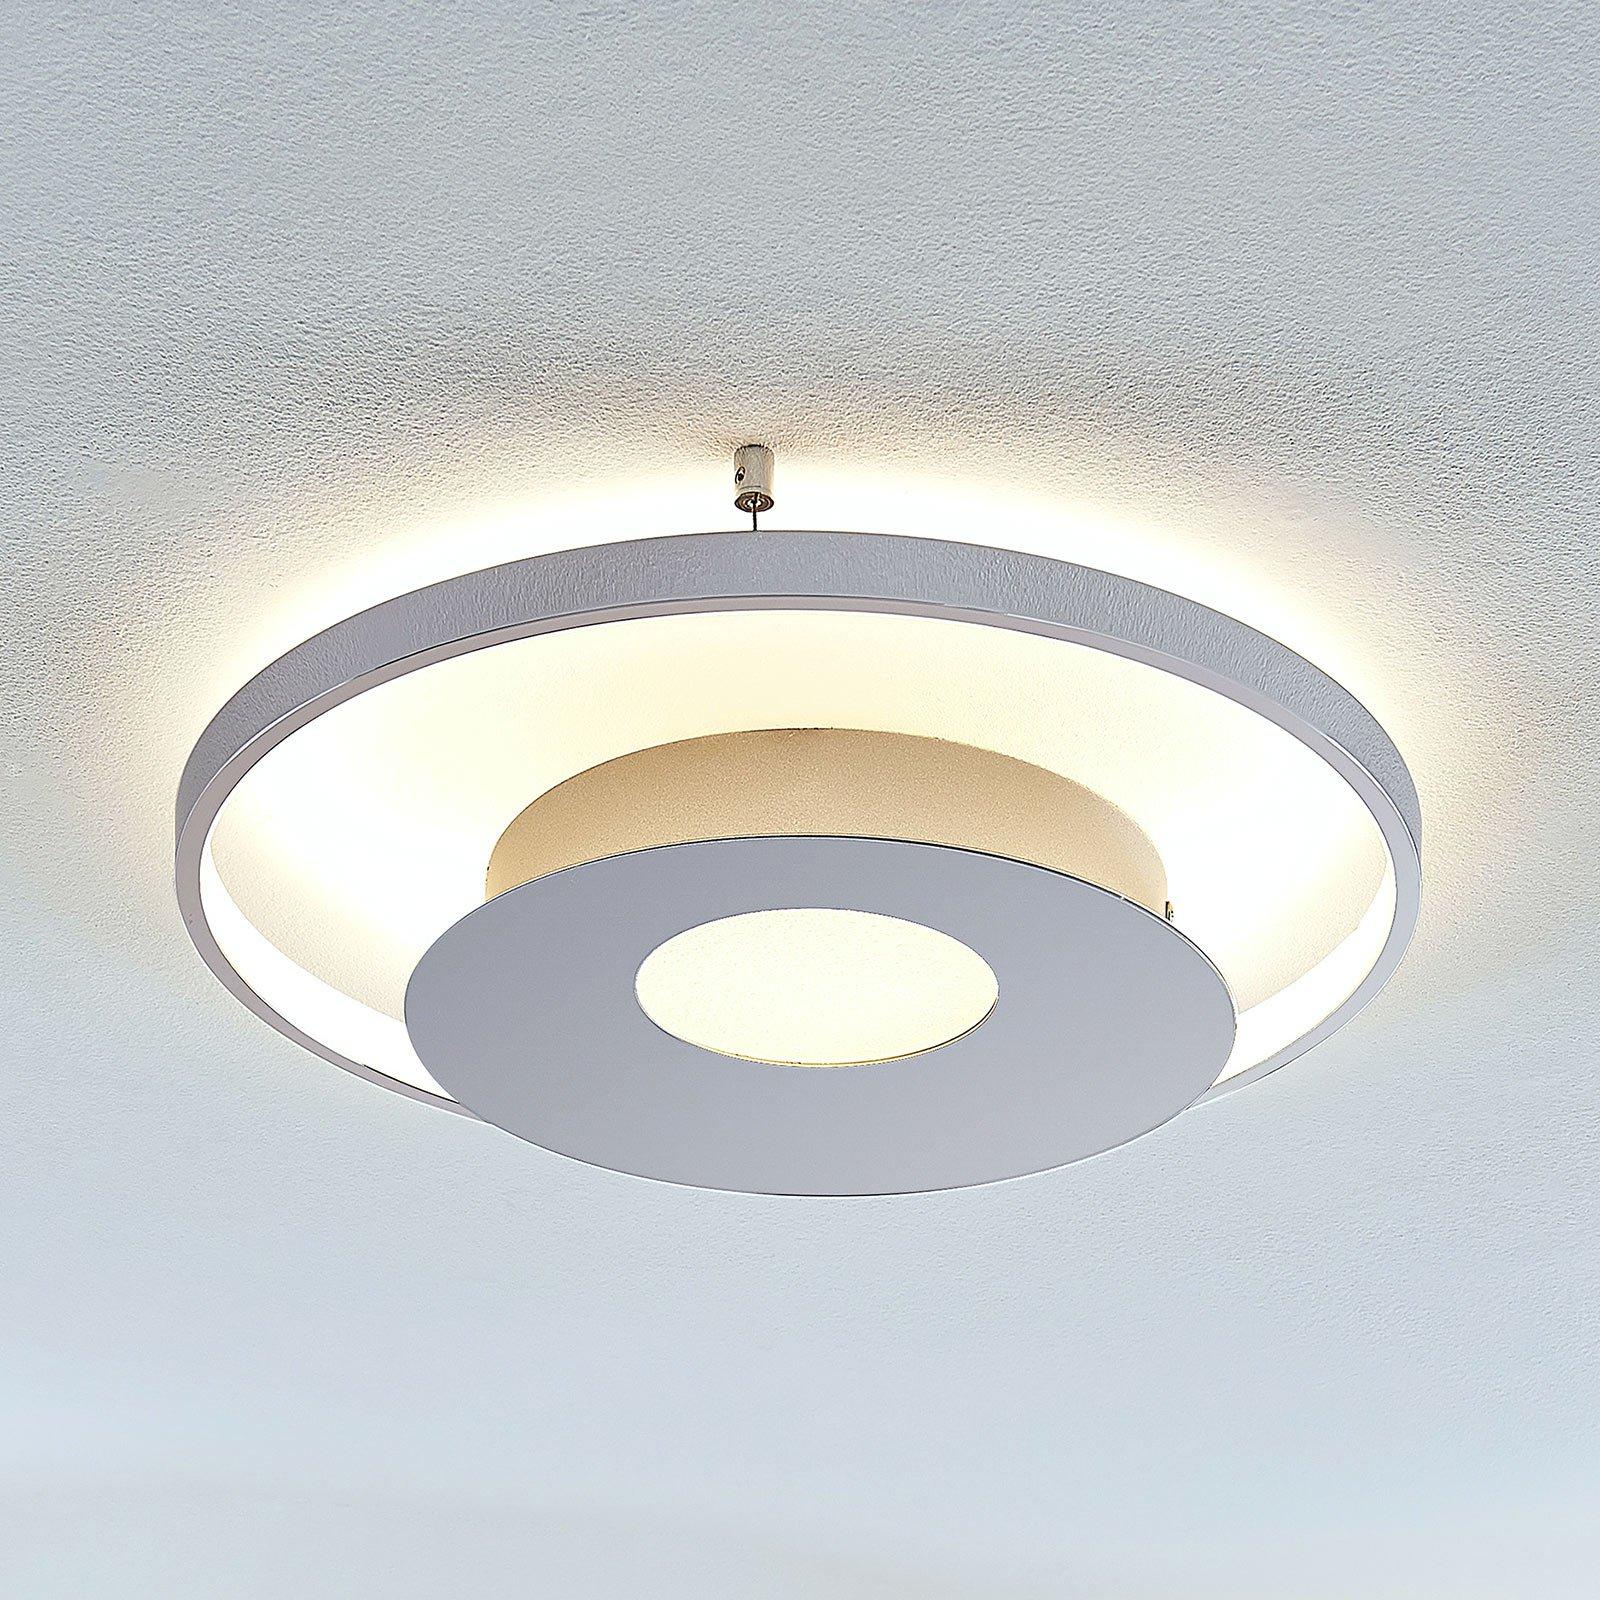 LED-taklampe Anays, rund, 42 cm